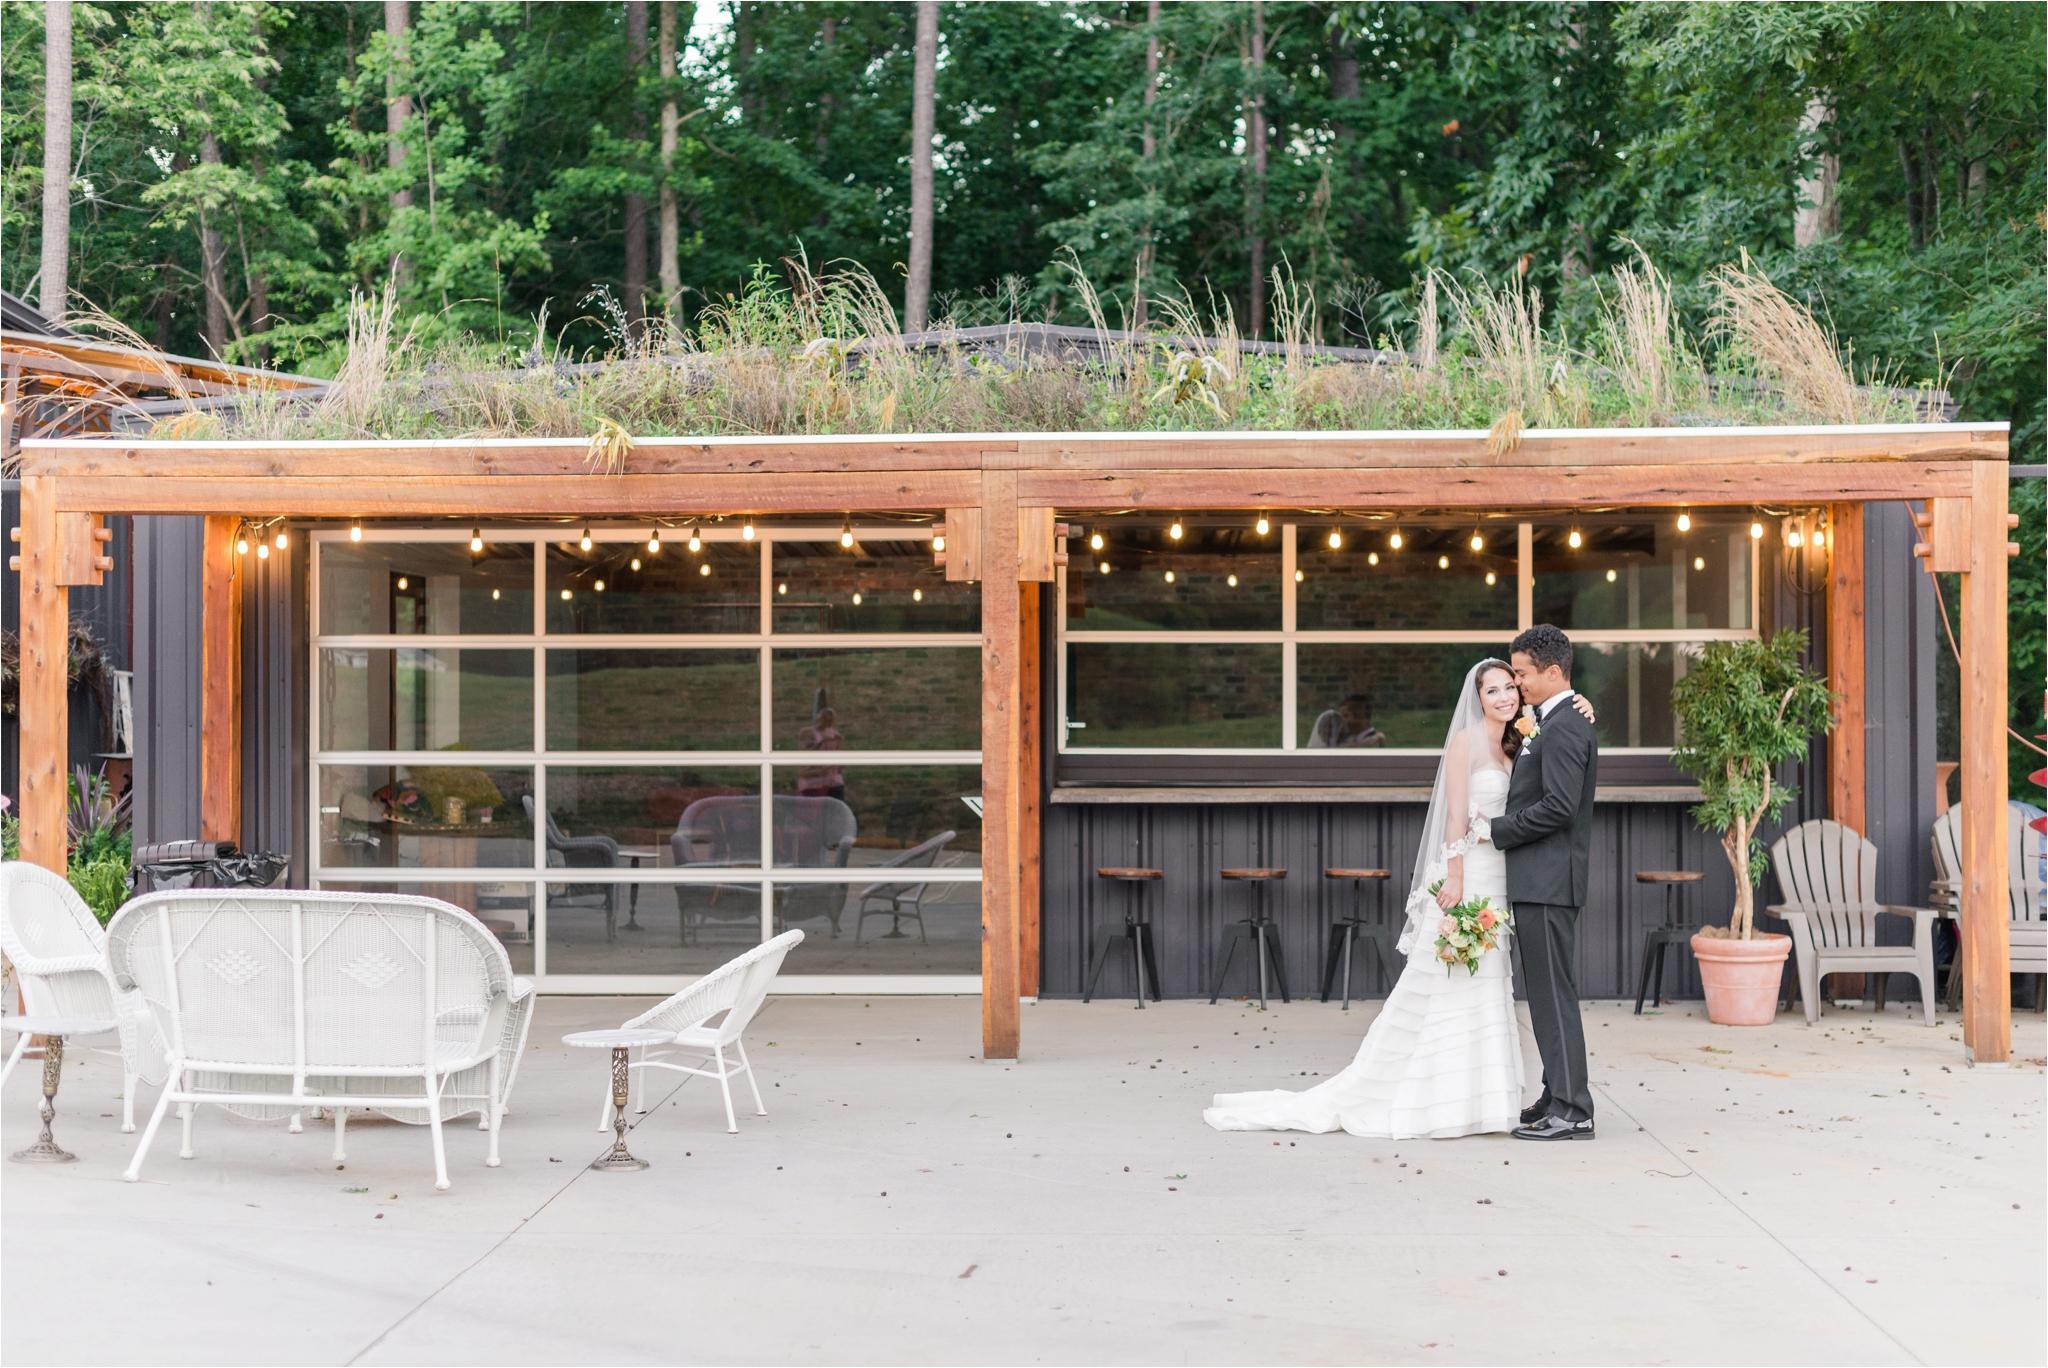 The Meadows Wedding Venue Raleigh North Carolina Wedding Photographer Jaclyn Auletta Photography